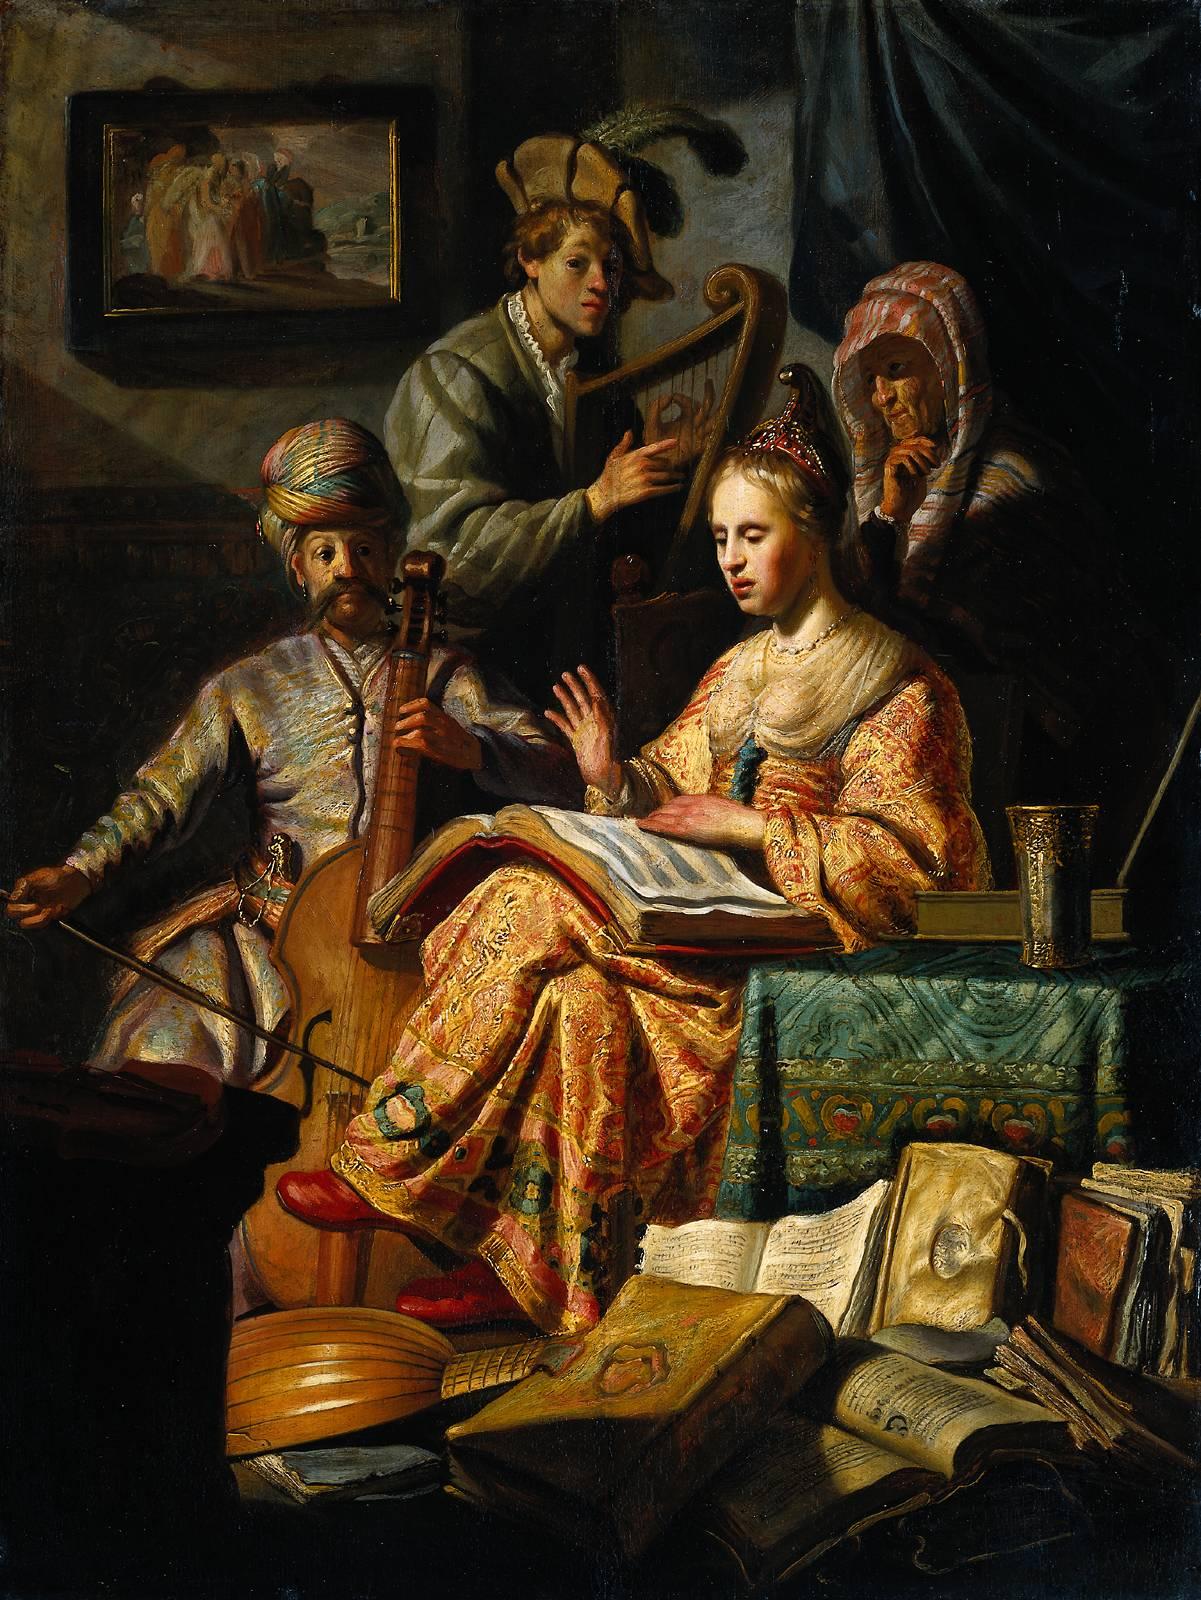 Menkveld-Rembrandt